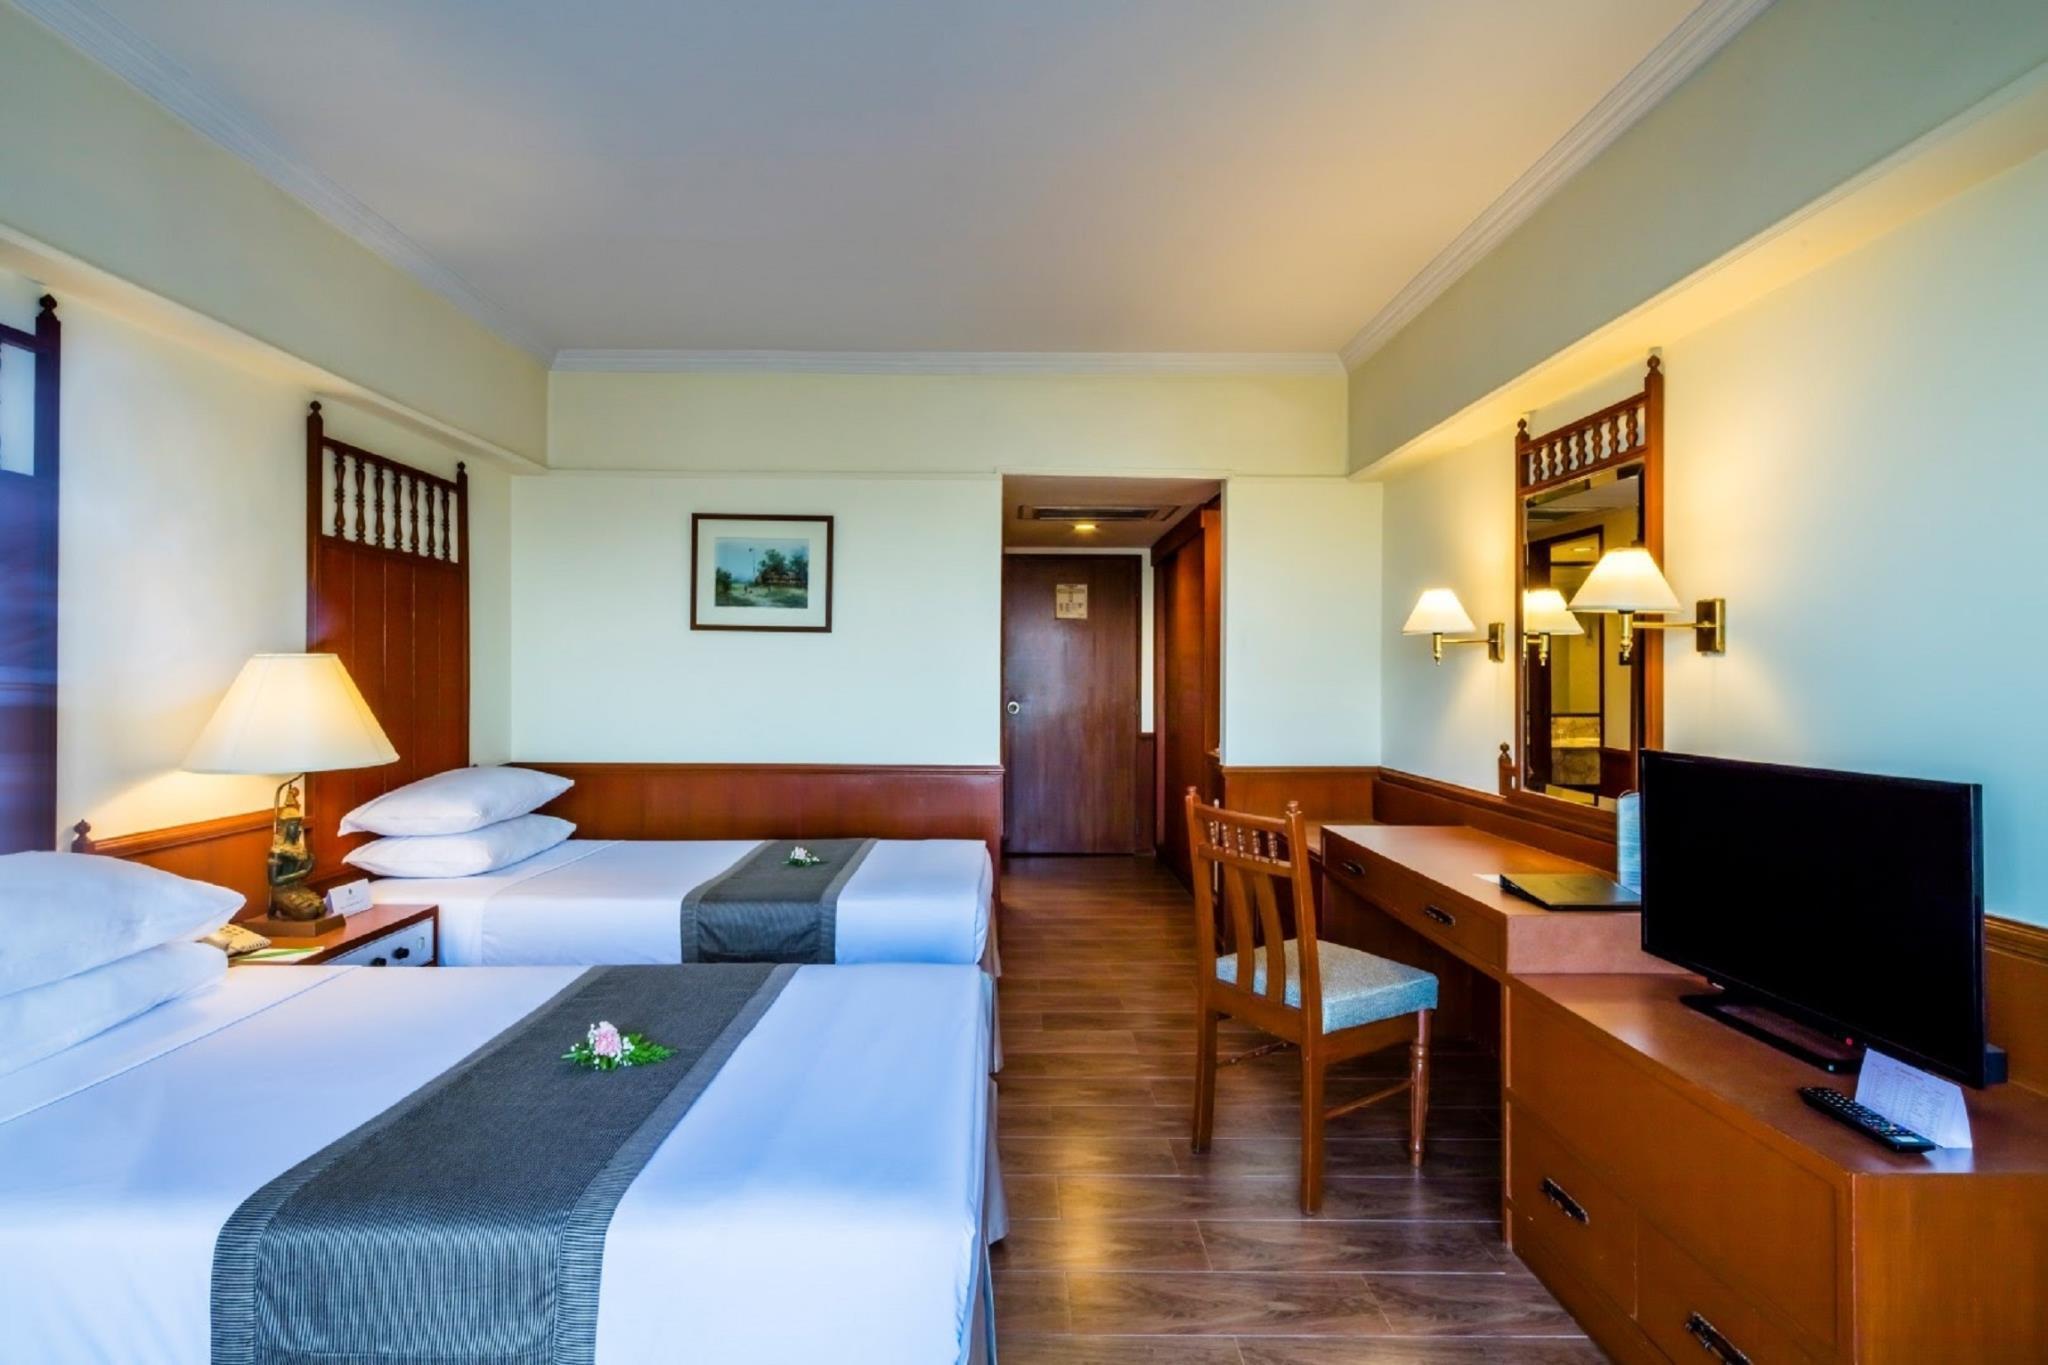 Bangkok Palace Hotel โรงแรมบางกอกพาเลส